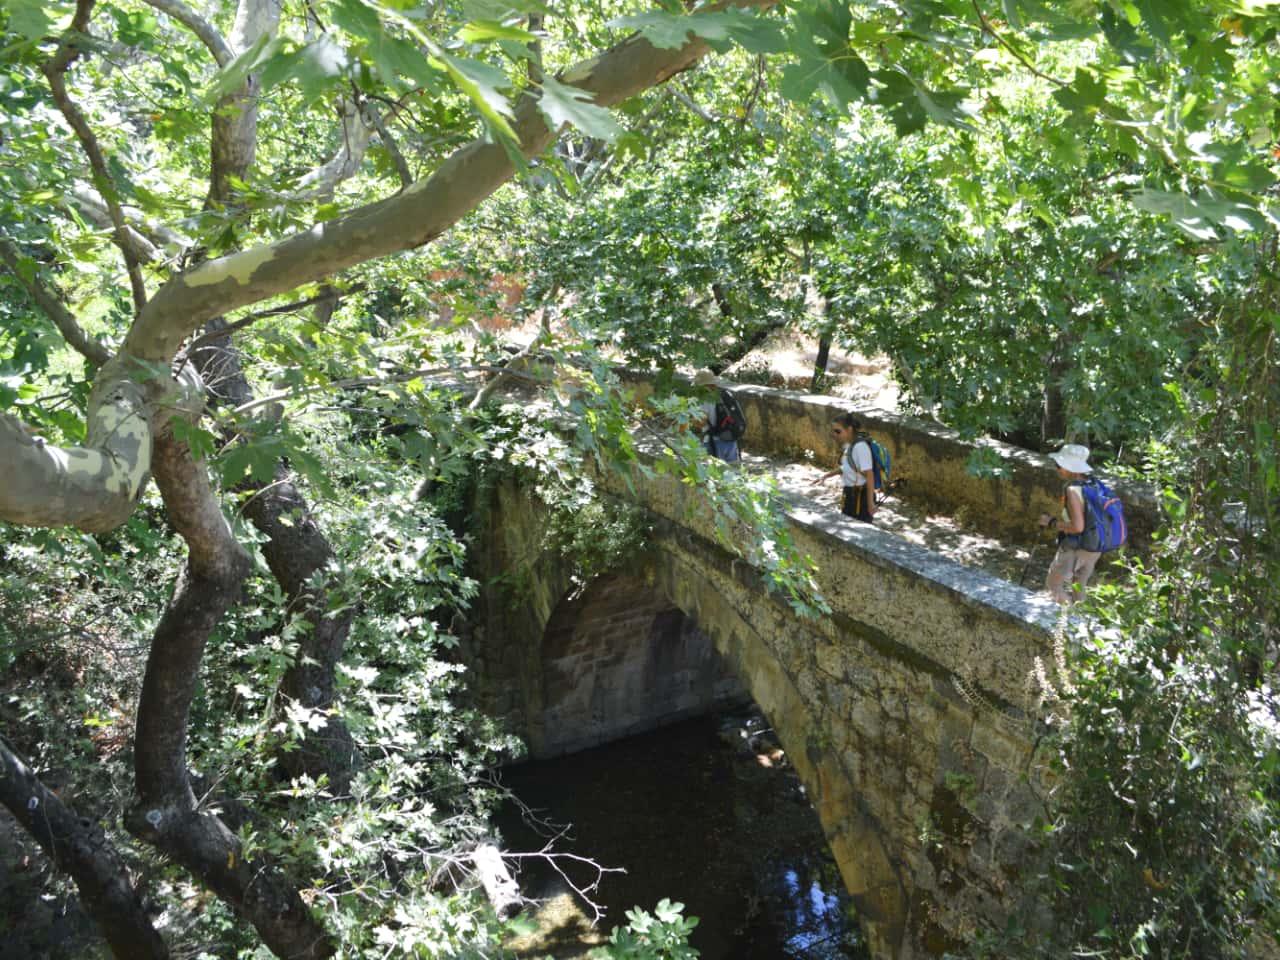 Full-Day Hiking Trip In South Chania Azogires - Anidri - Gialiskari Beach, hiking paleochora chania, hiking south chania crete, hiking trip cretan villages monasteries, best hiking trips chania crete, best activities chania